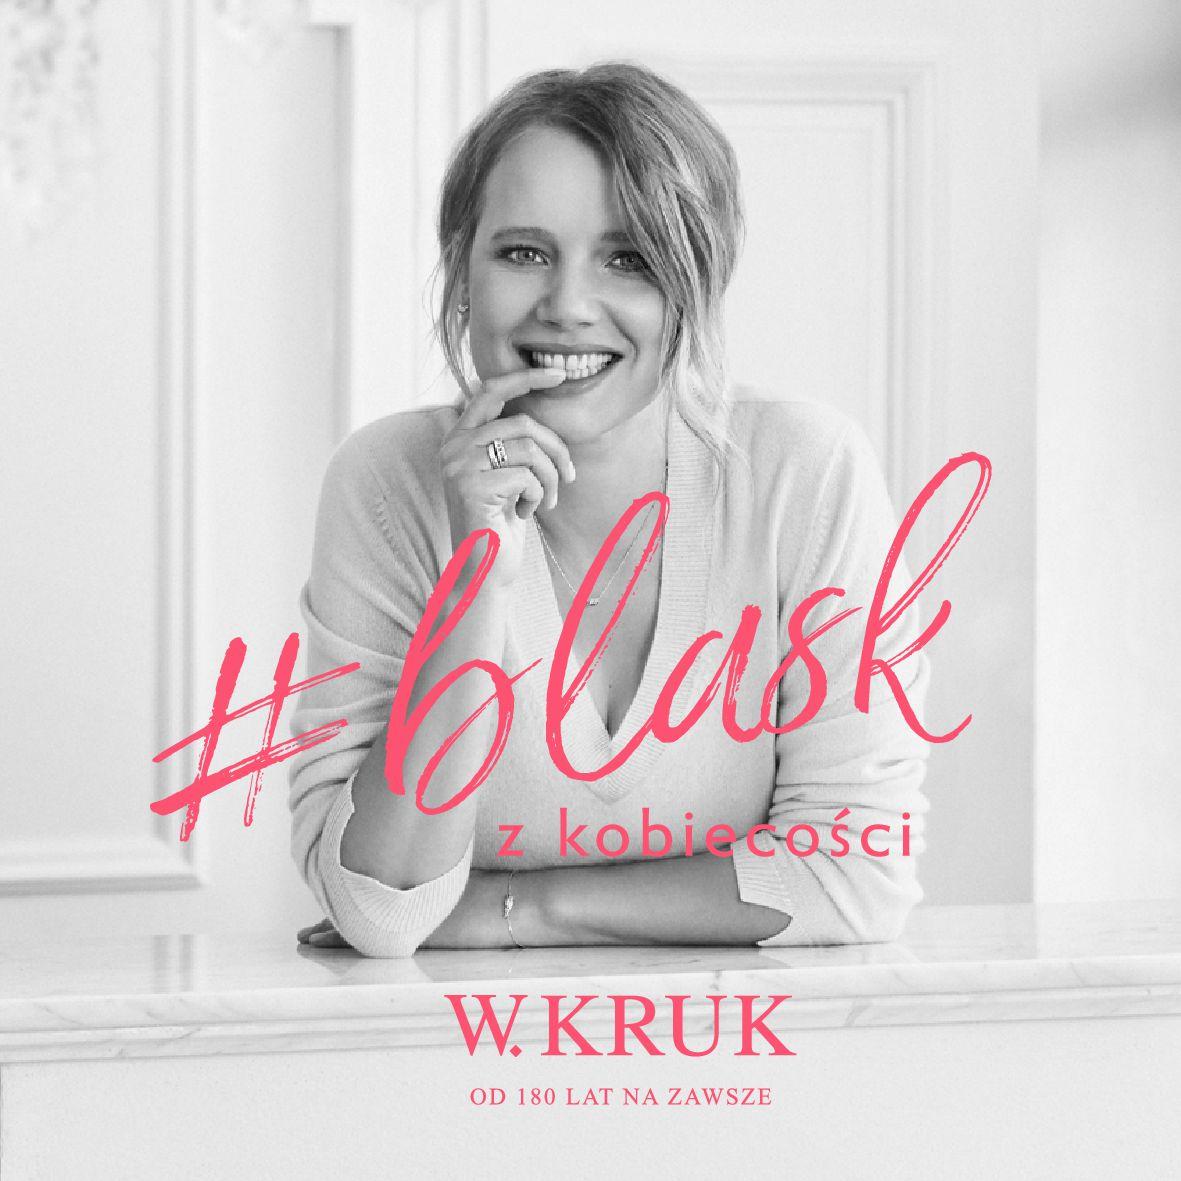 Gazetka W. KRUK: Katalog - Kolekcja Blask 2021-02-17 page-1